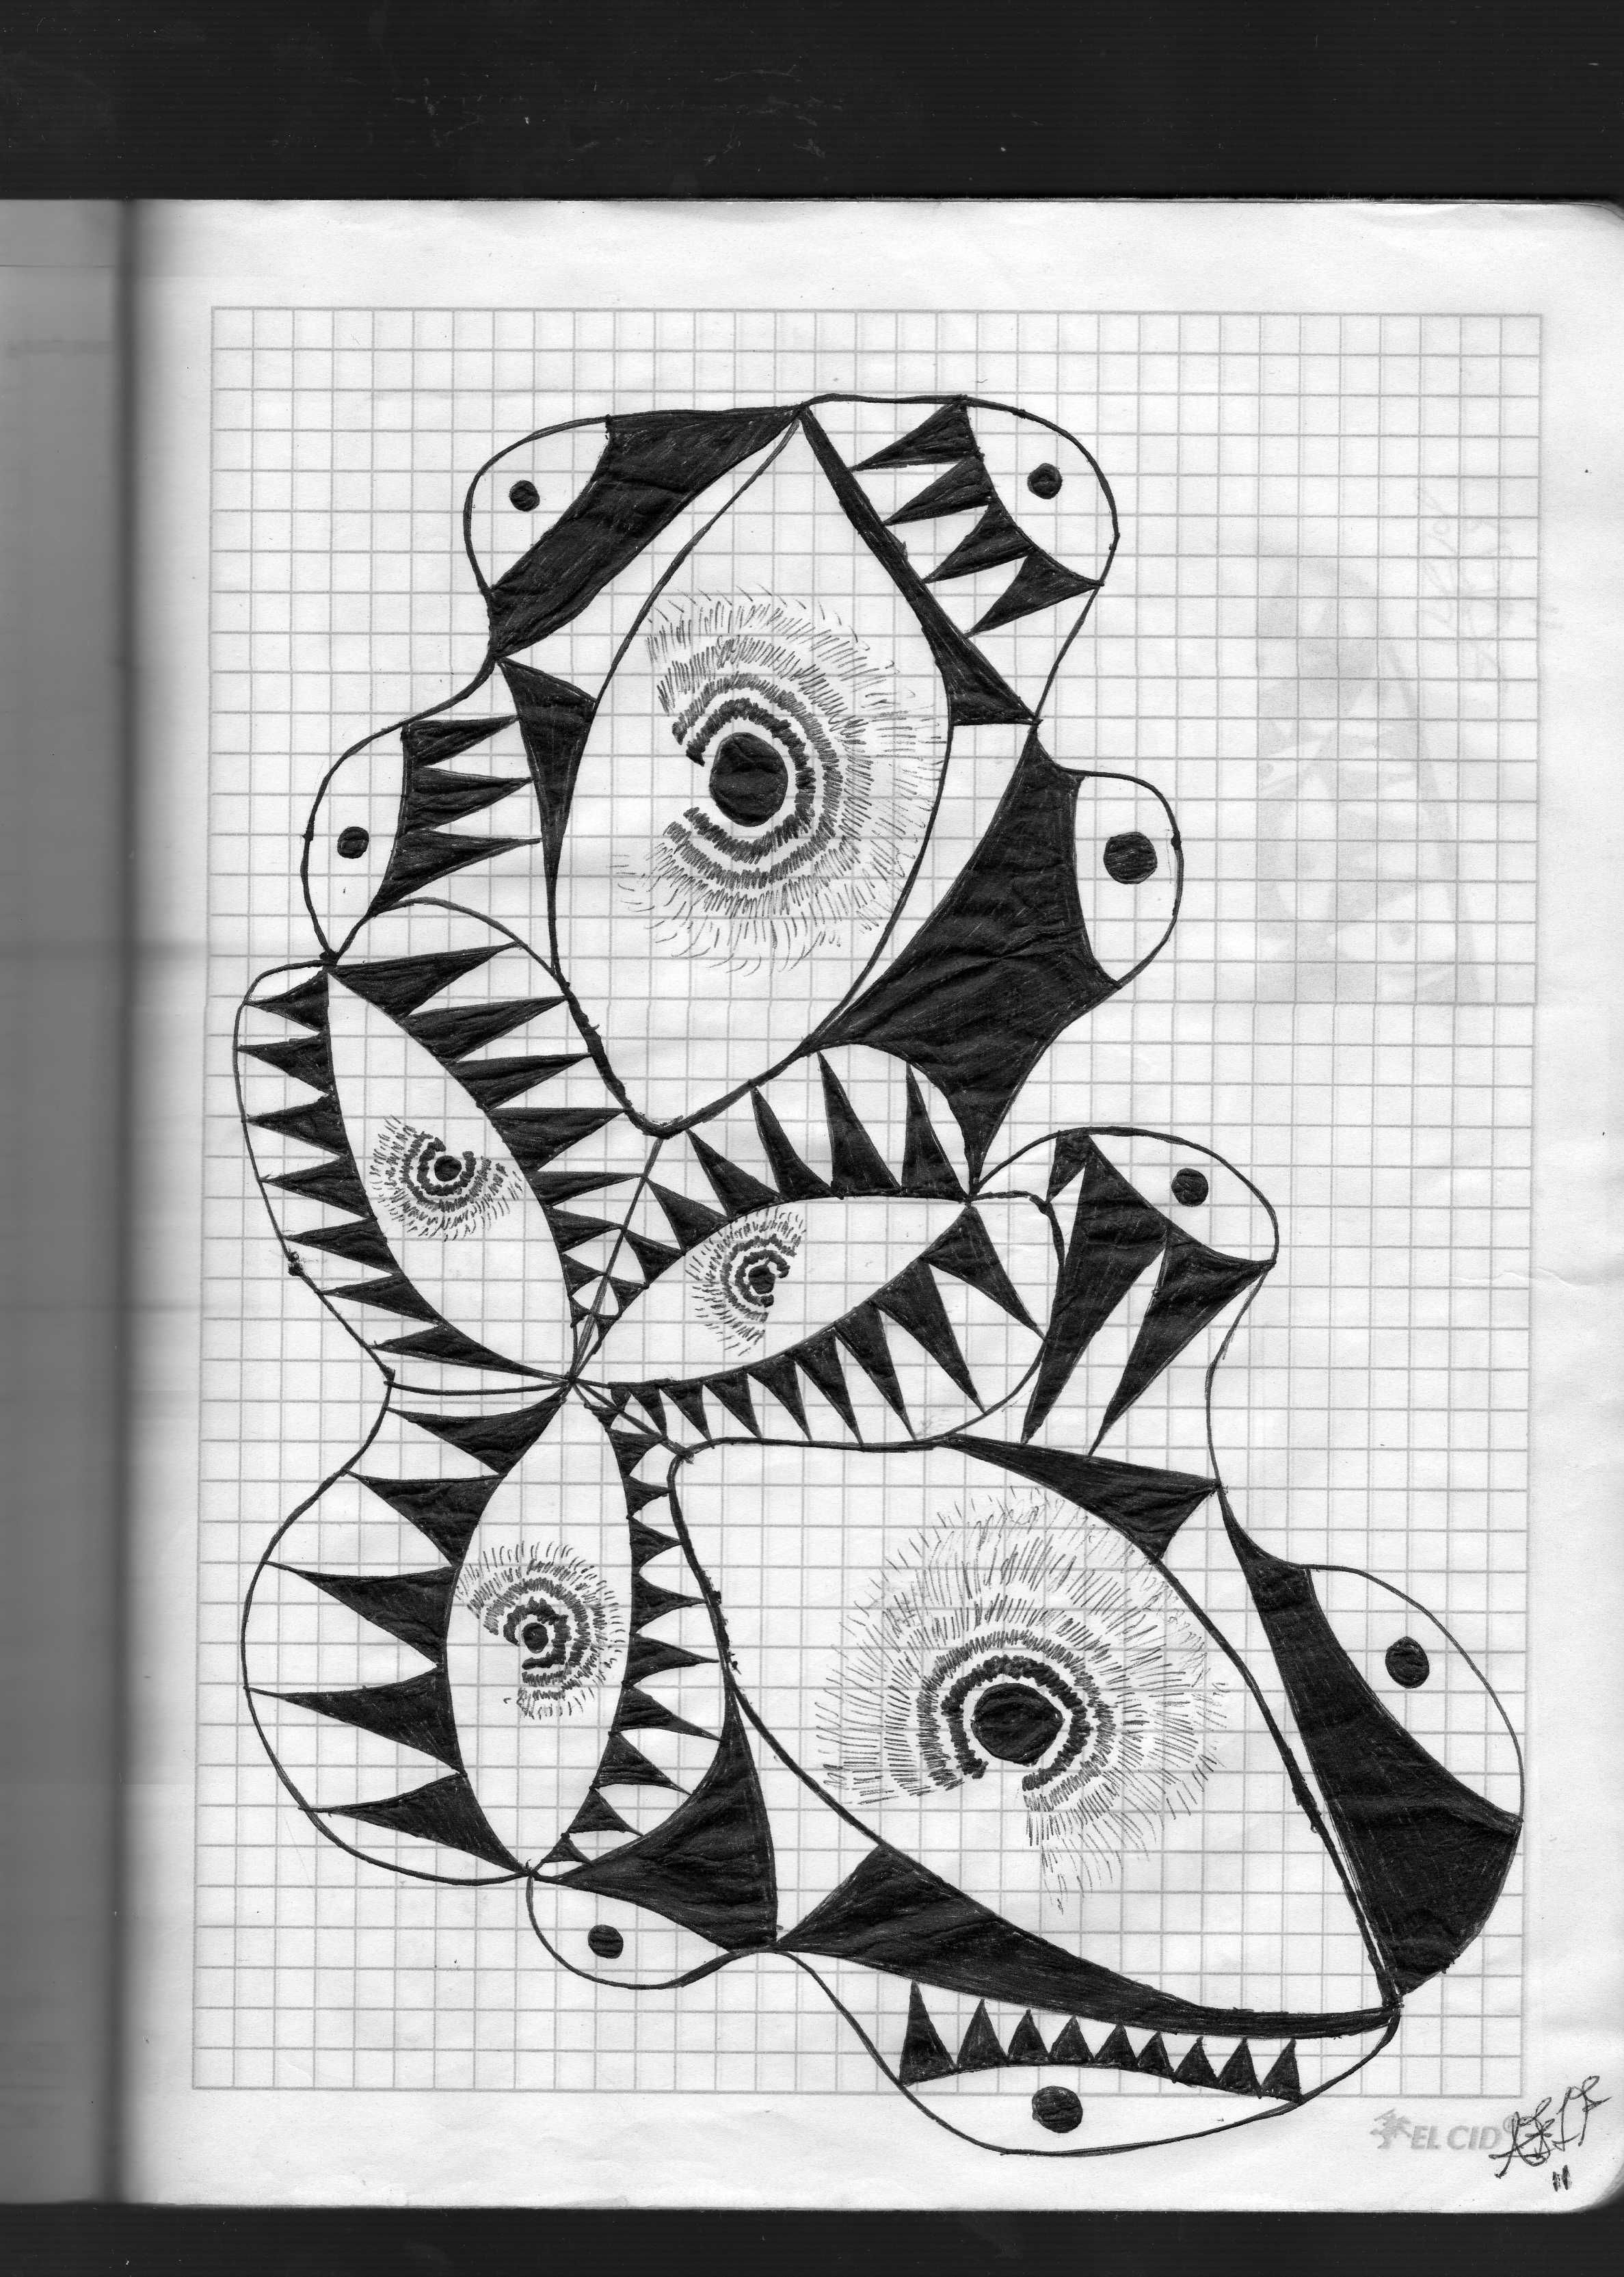 Dibujo Abstracto De Ojos Y Espinas Contemporary Art Abstract Abstract Art